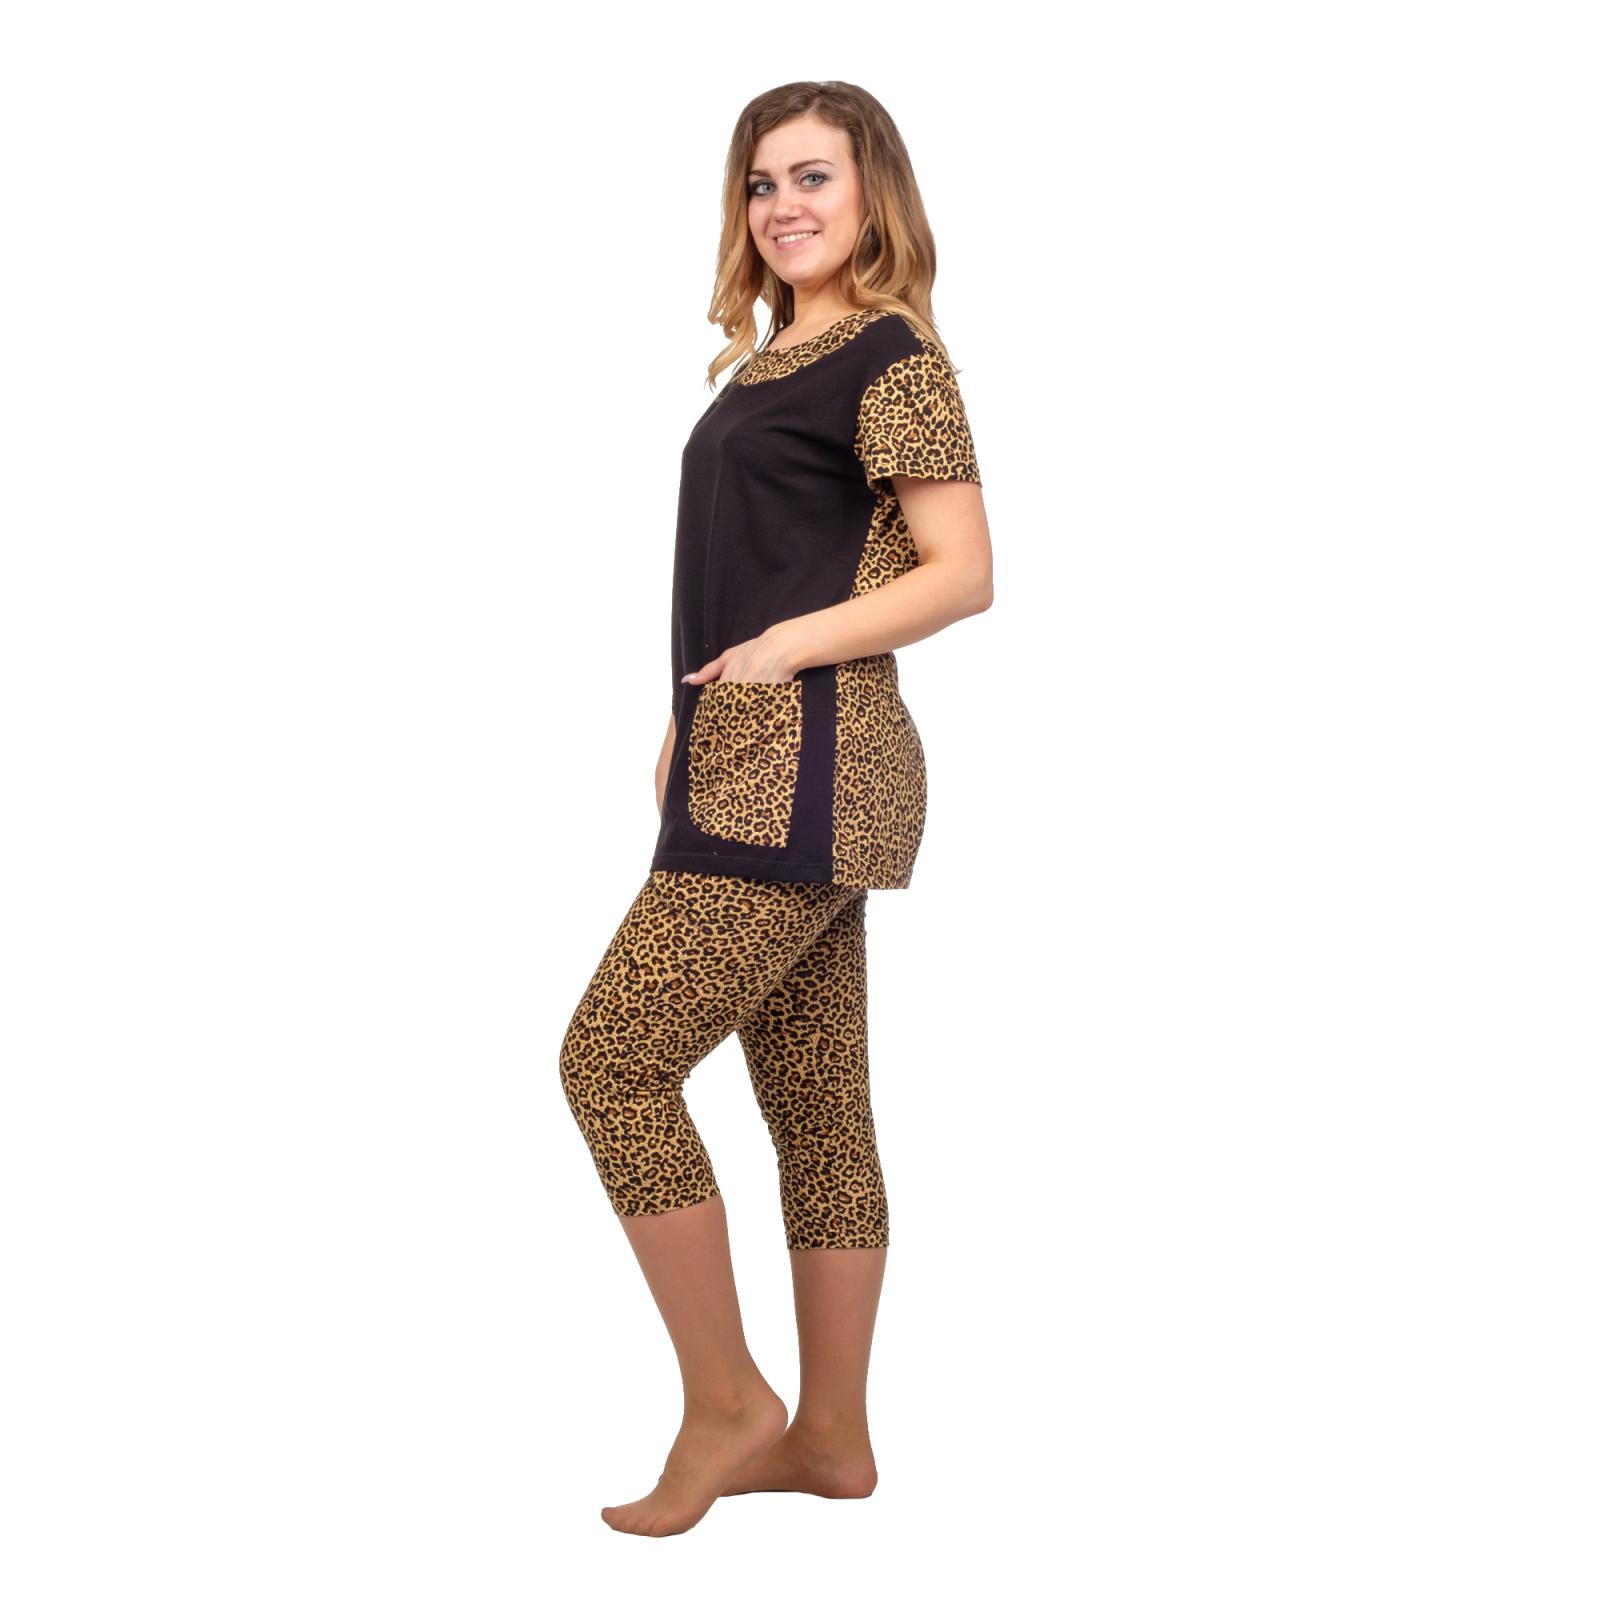 Домашний костюм Леопард (бриджи+туника) М-0113Ч